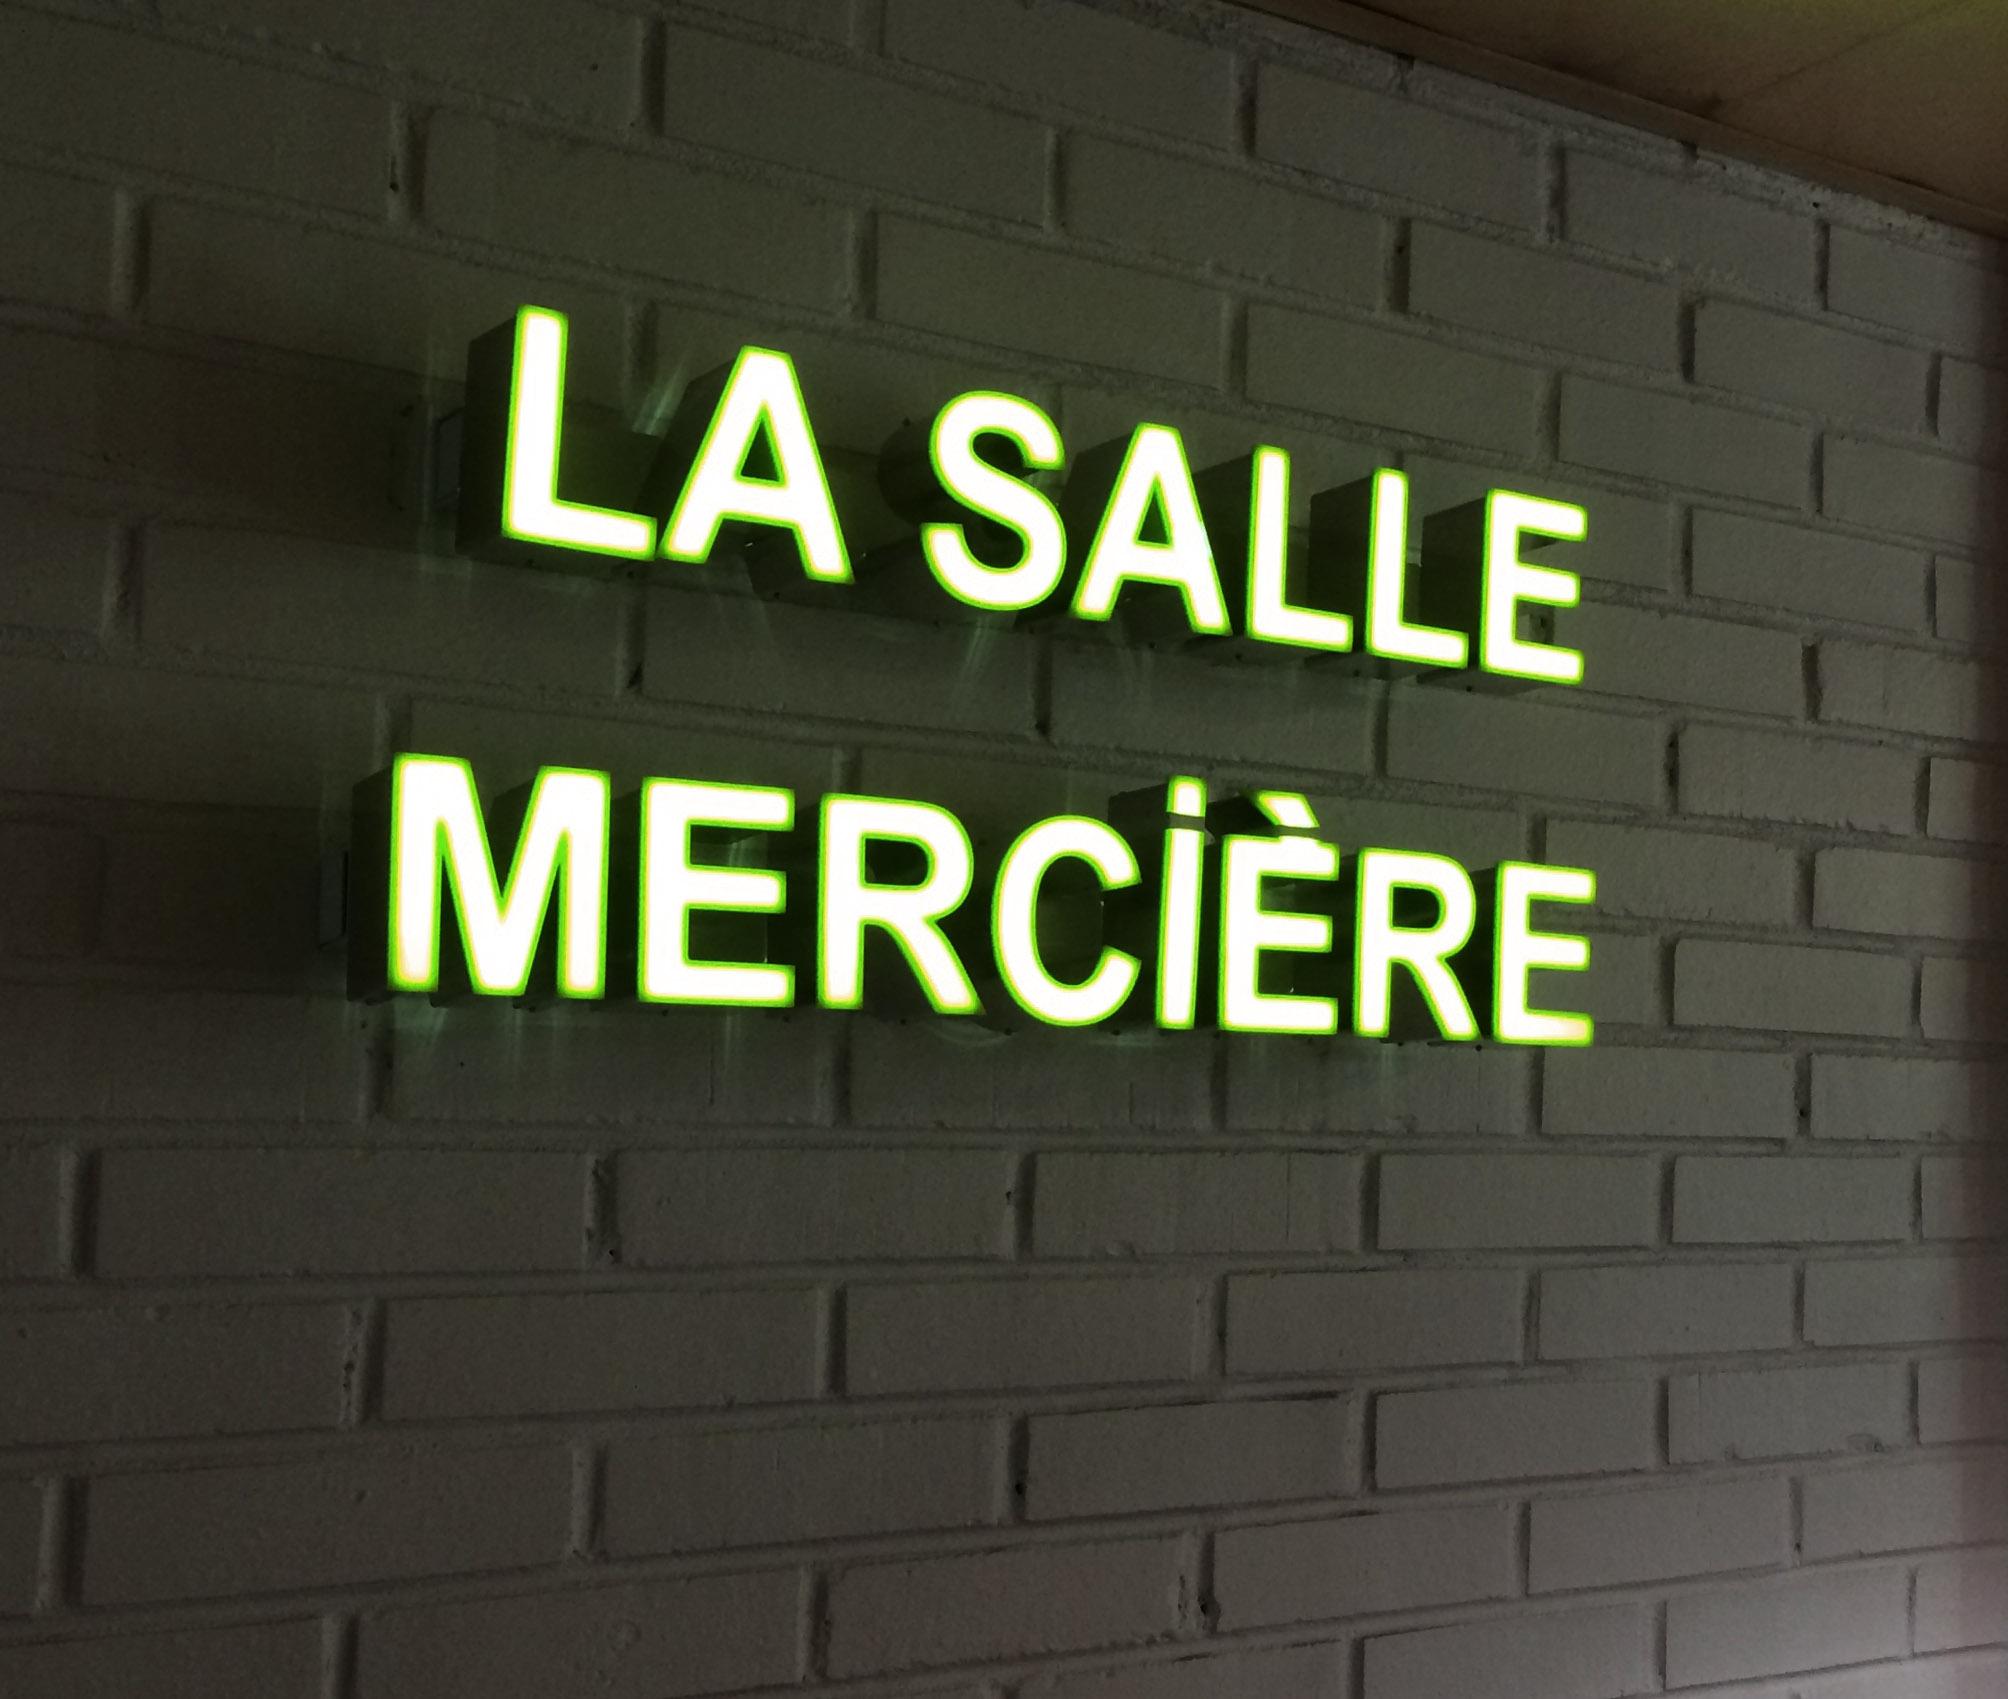 Salle merciere